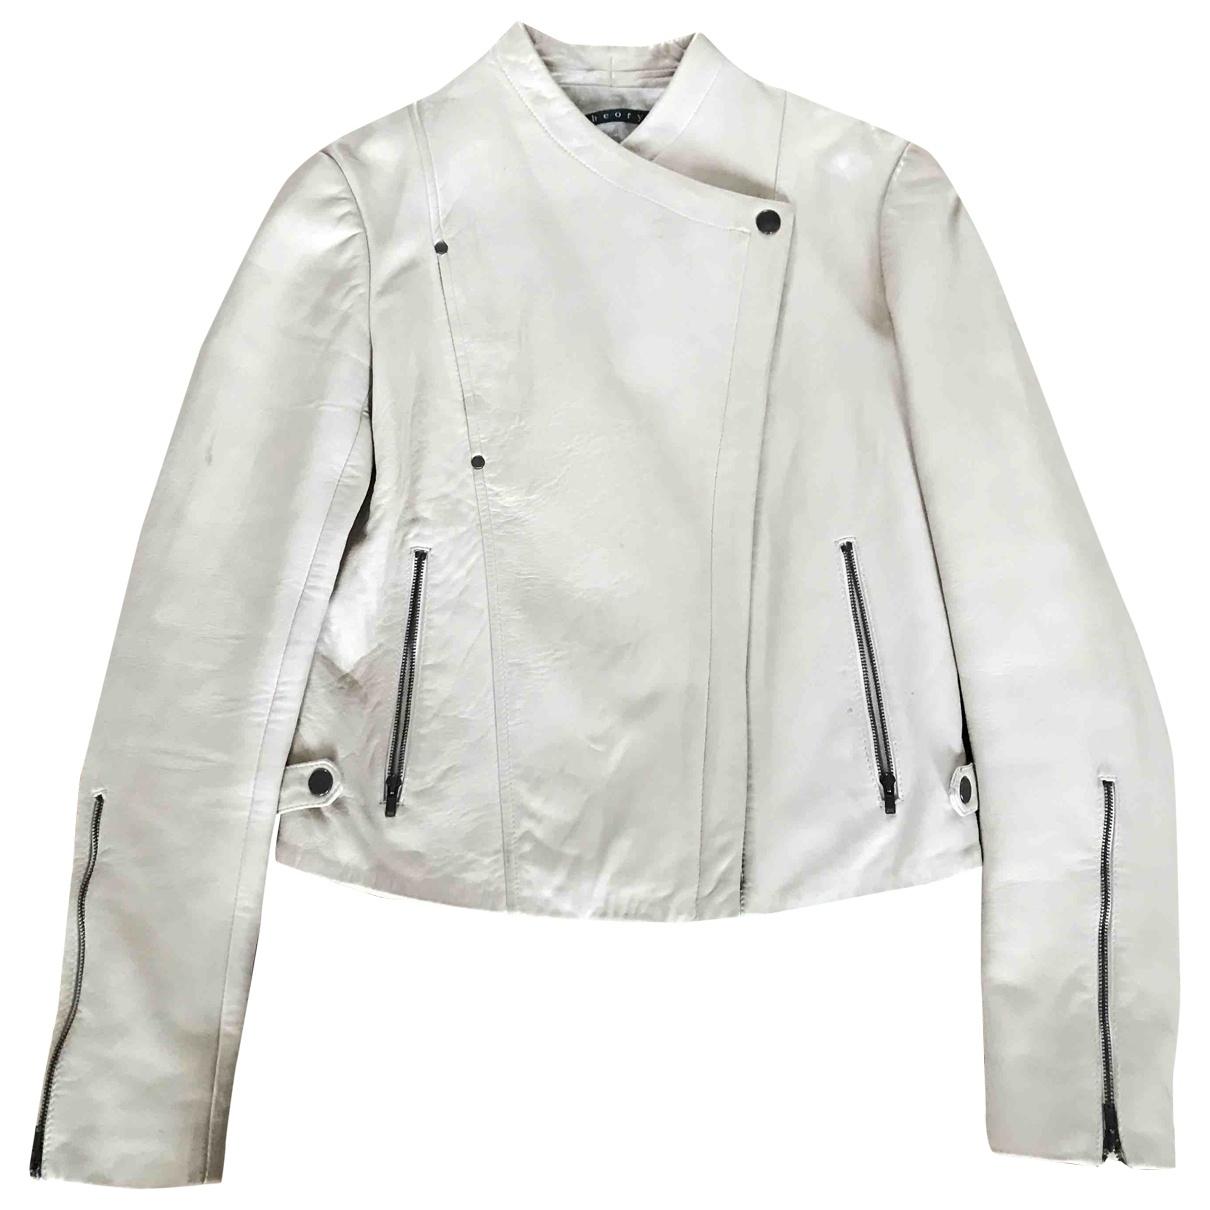 Theory \N Beige Leather jacket for Women S International